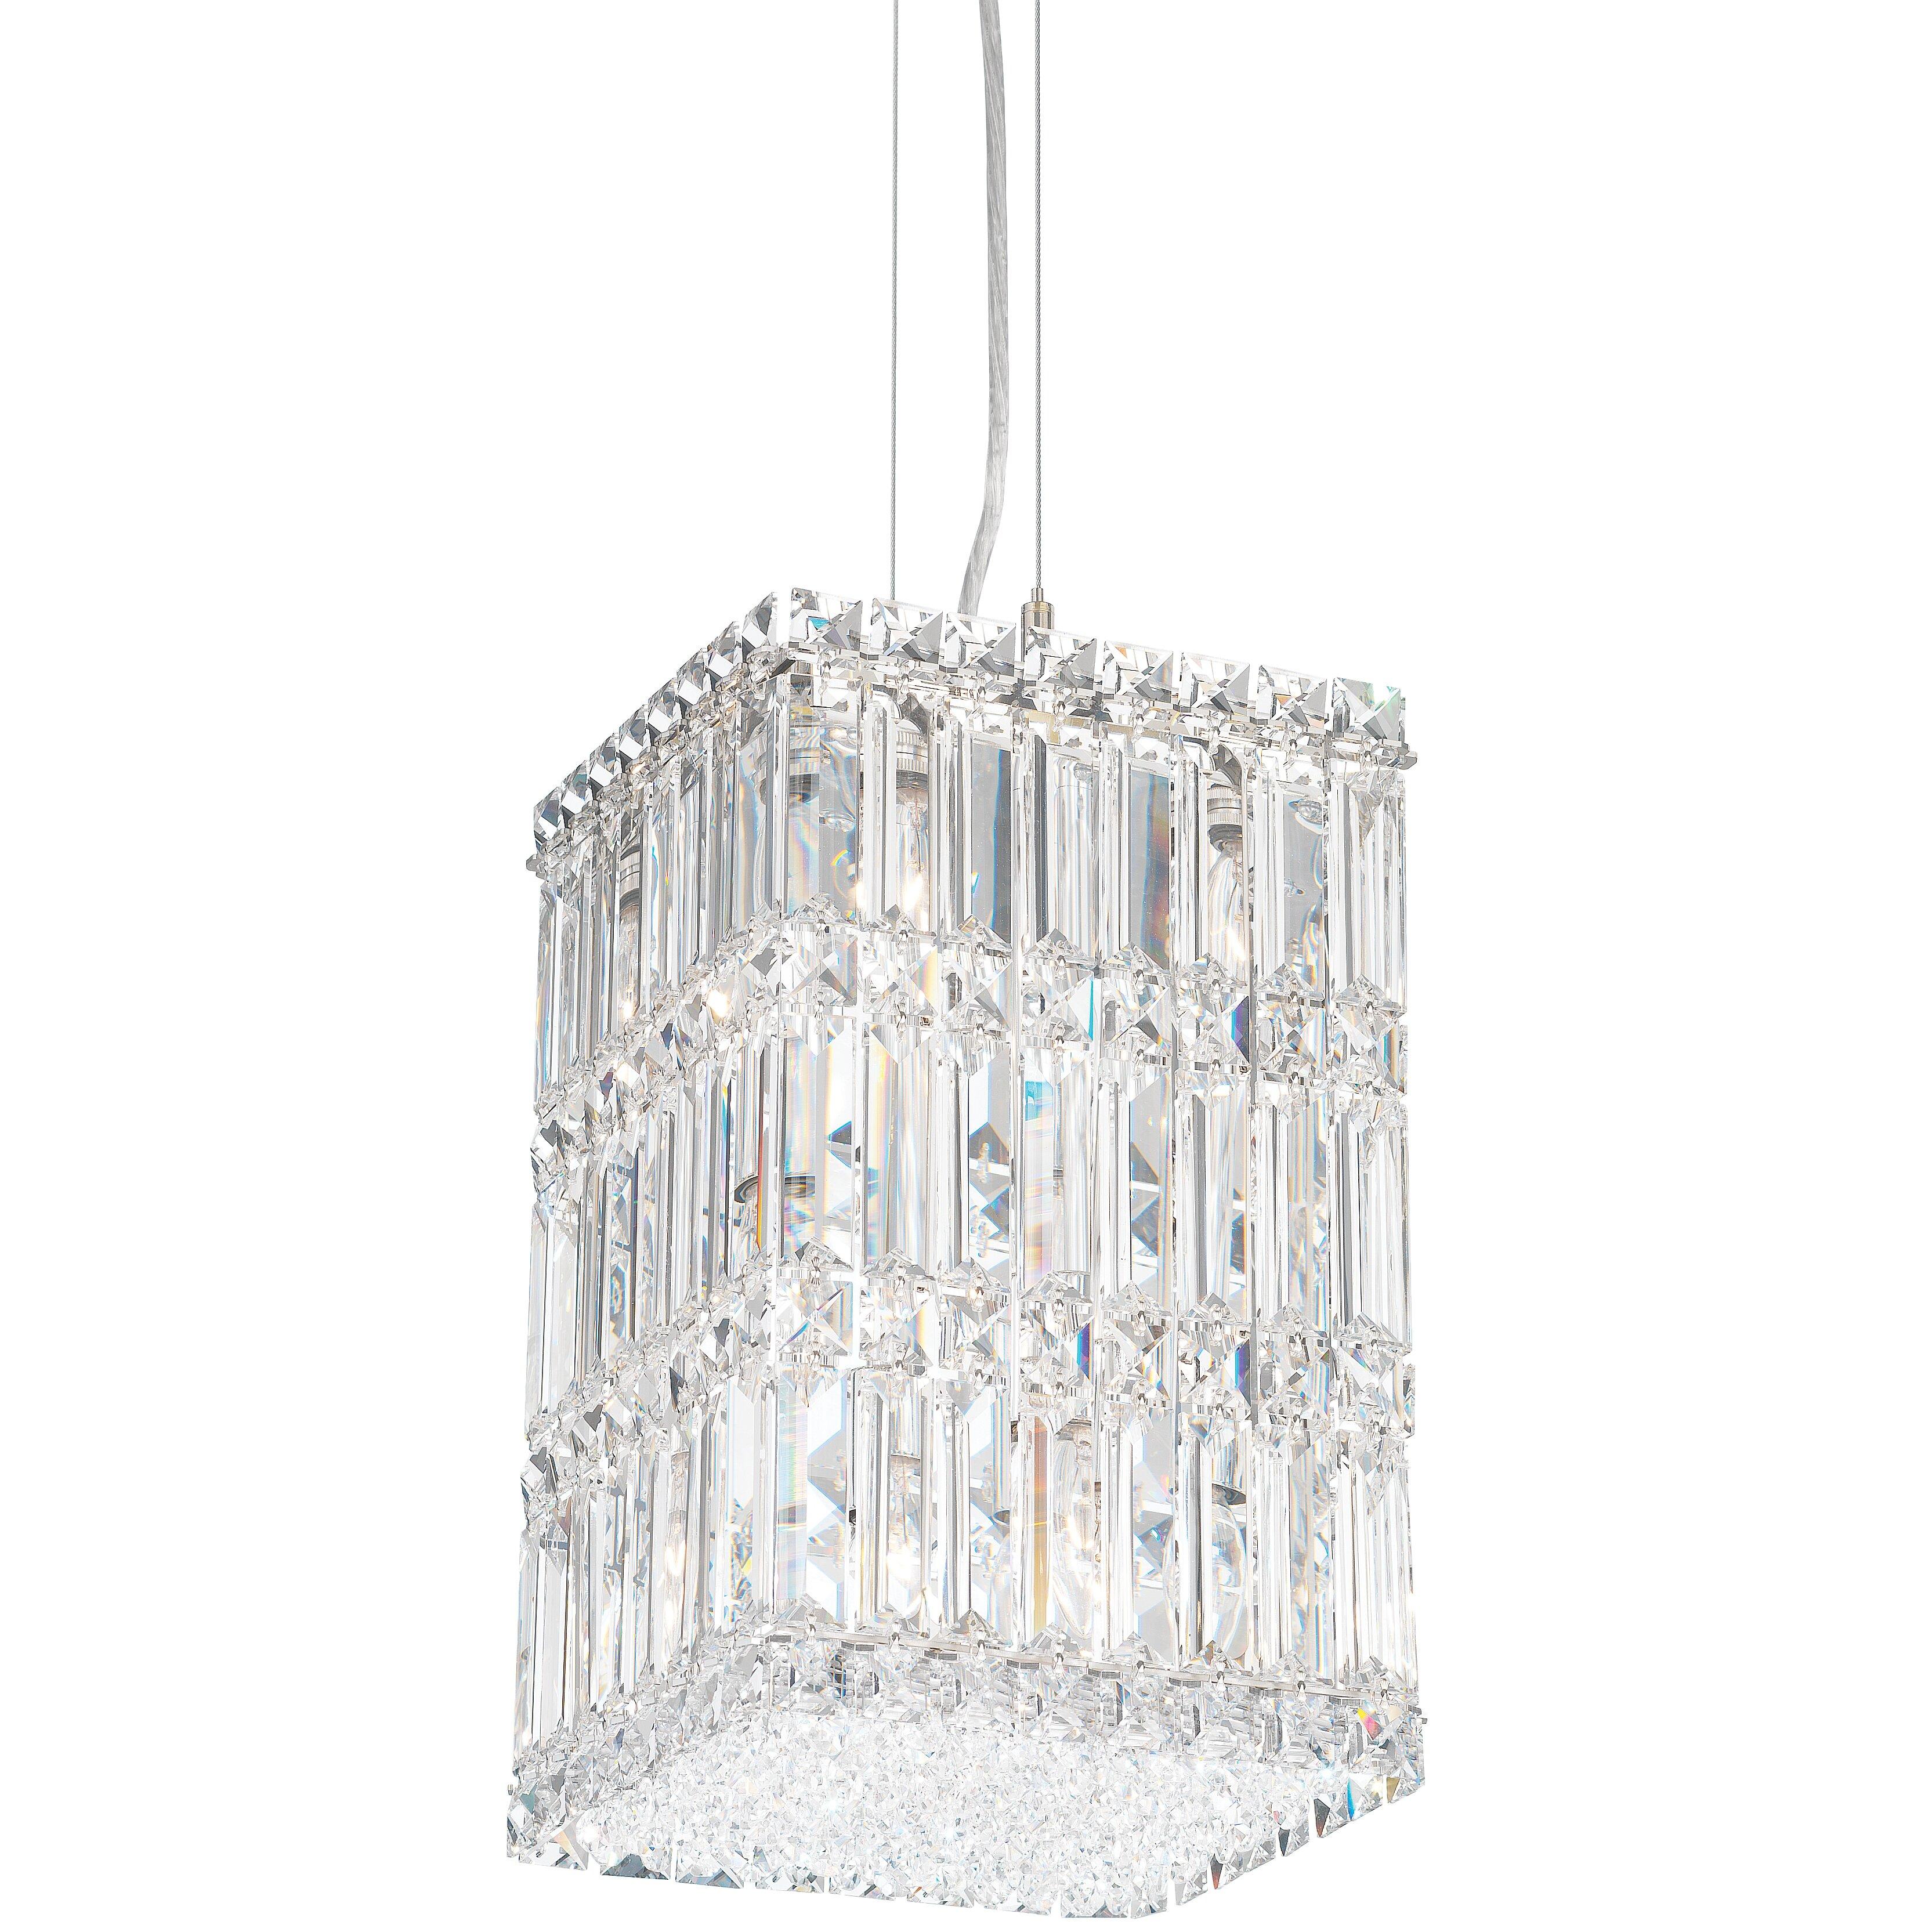 Schonbek Chandelier Wayfair: Schonbek Quantum 9 Light Chandelier With Swarovski Crystal